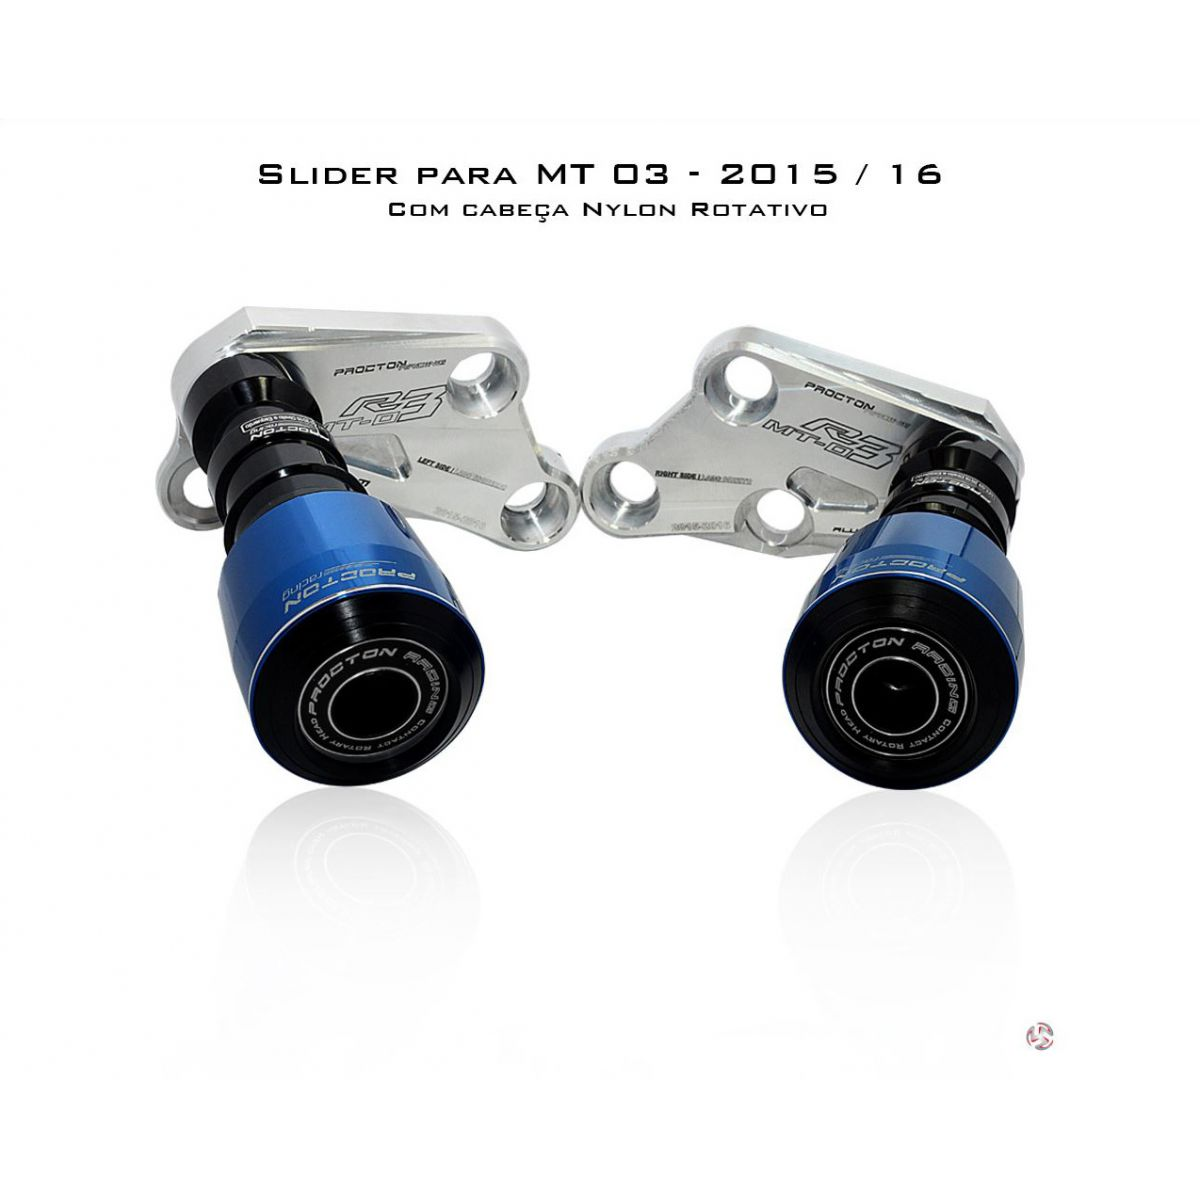 Slider Procton com Amortecimento Yamaha MT03 - 16 (NYLON ROTATIVO)